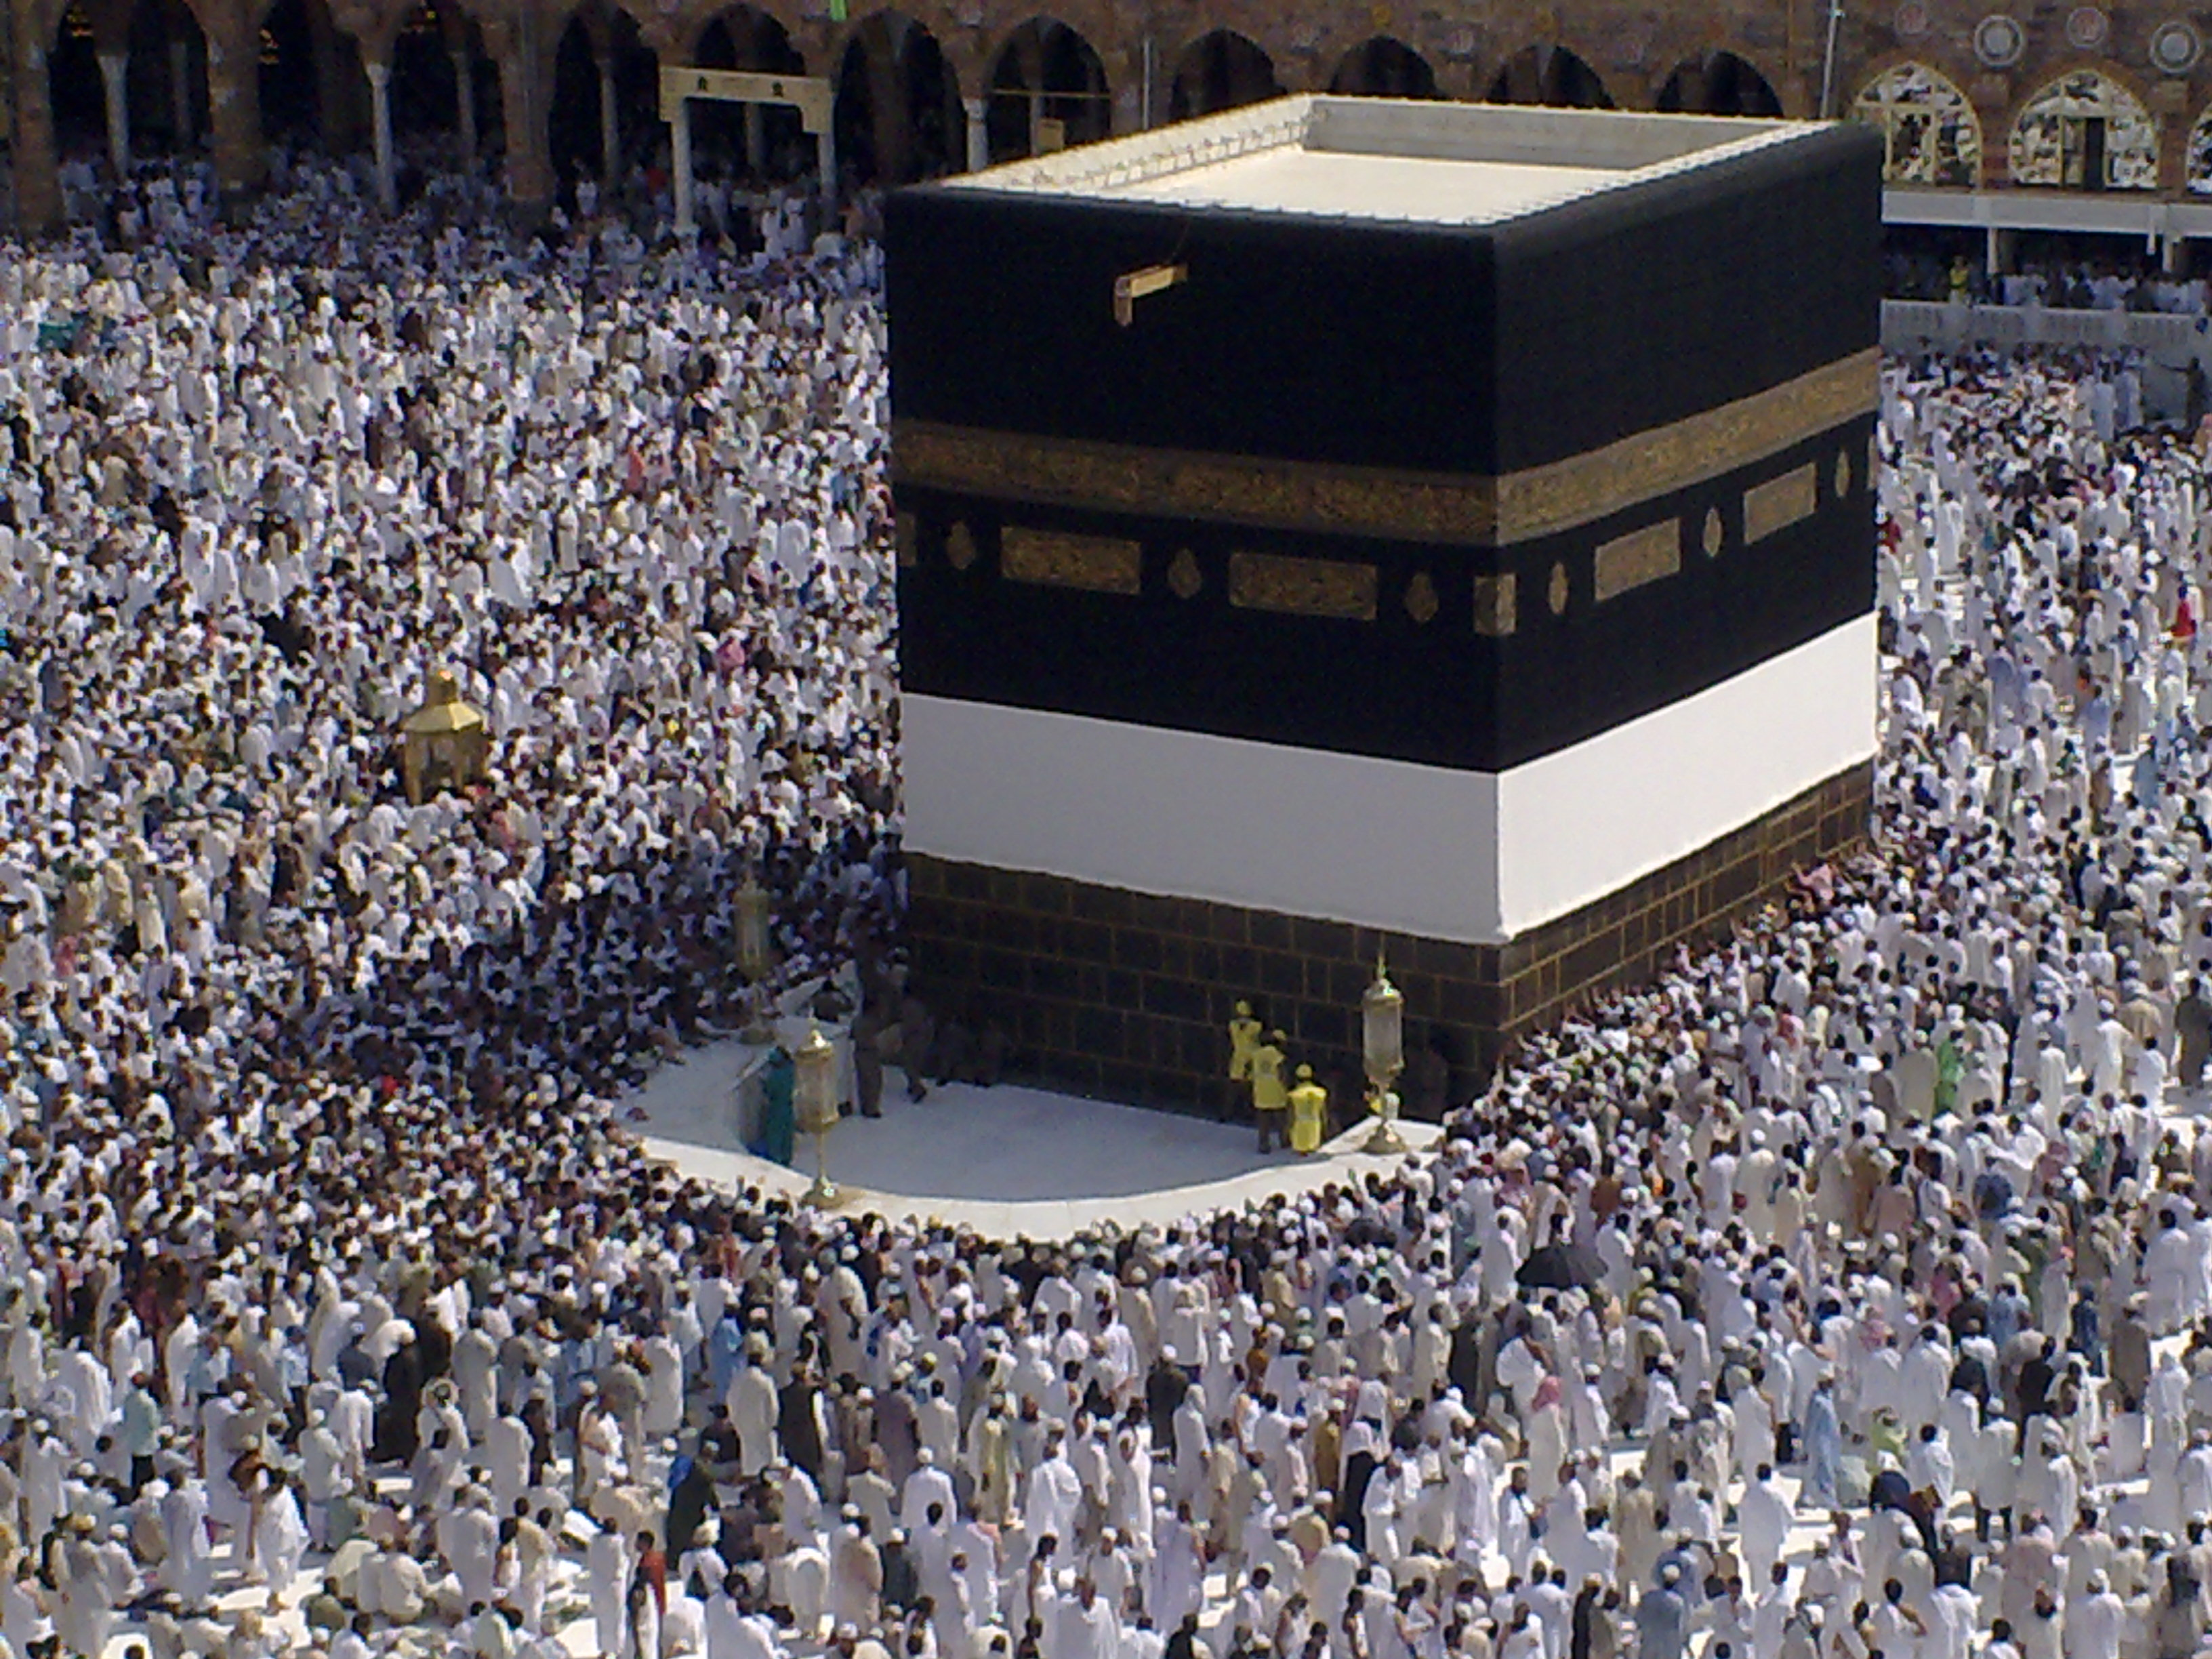 Beginnings of Islamic reform in Saudi Arabia